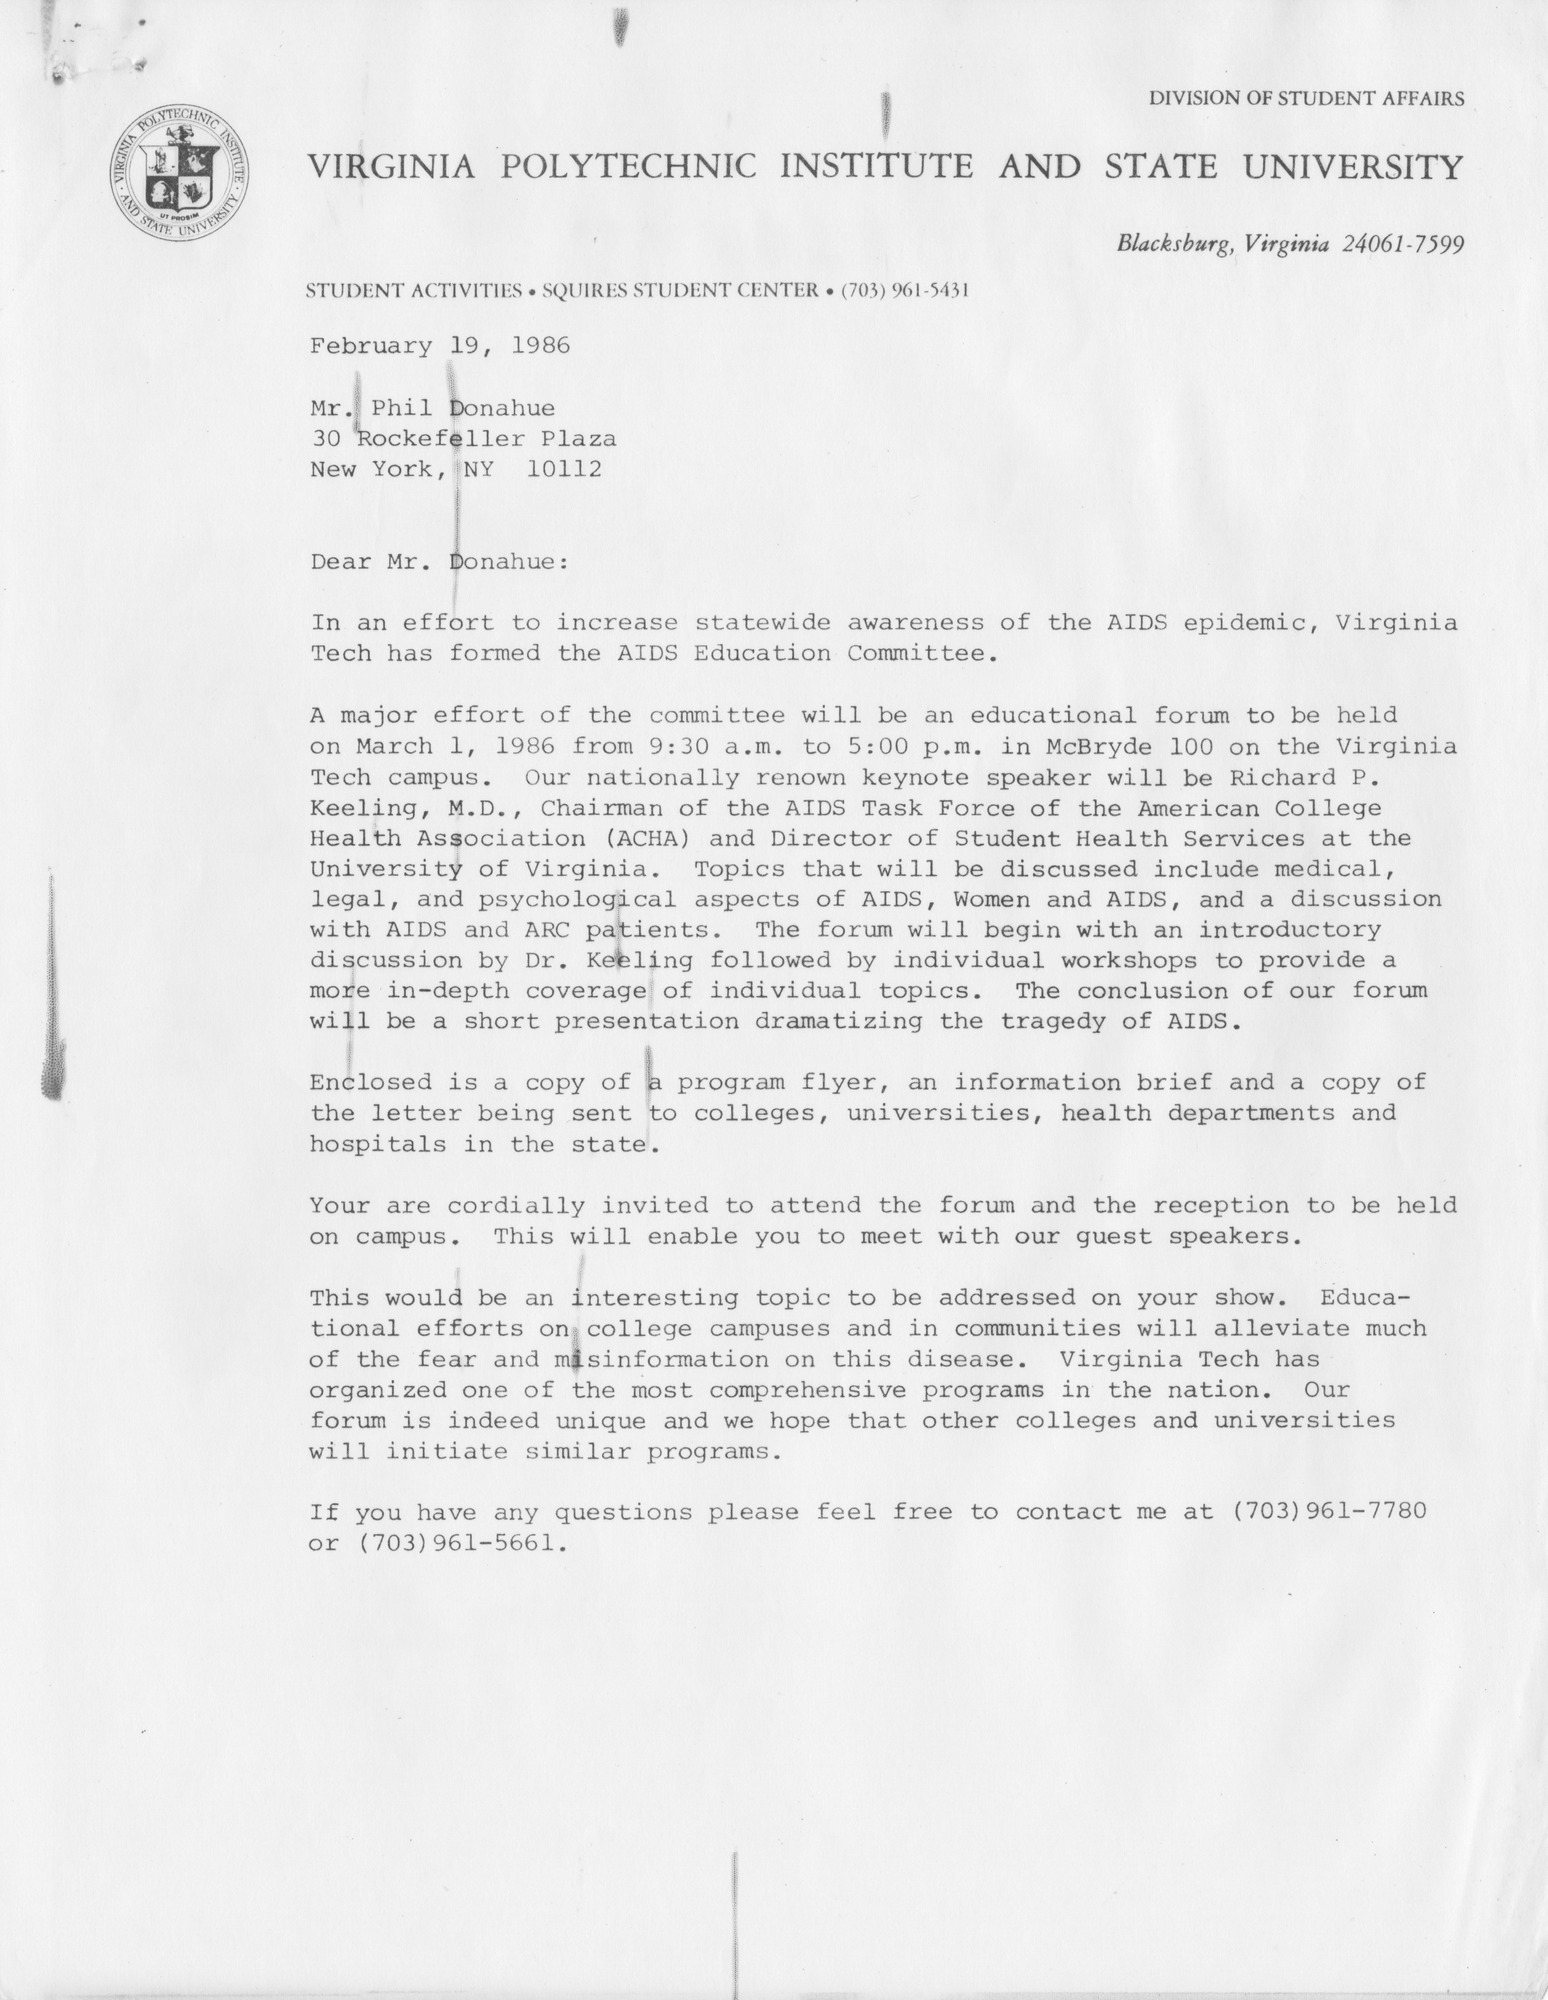 Ms2014-010_WeberMark_CorrespondencePhilDonahue_1986_0219a.jpg